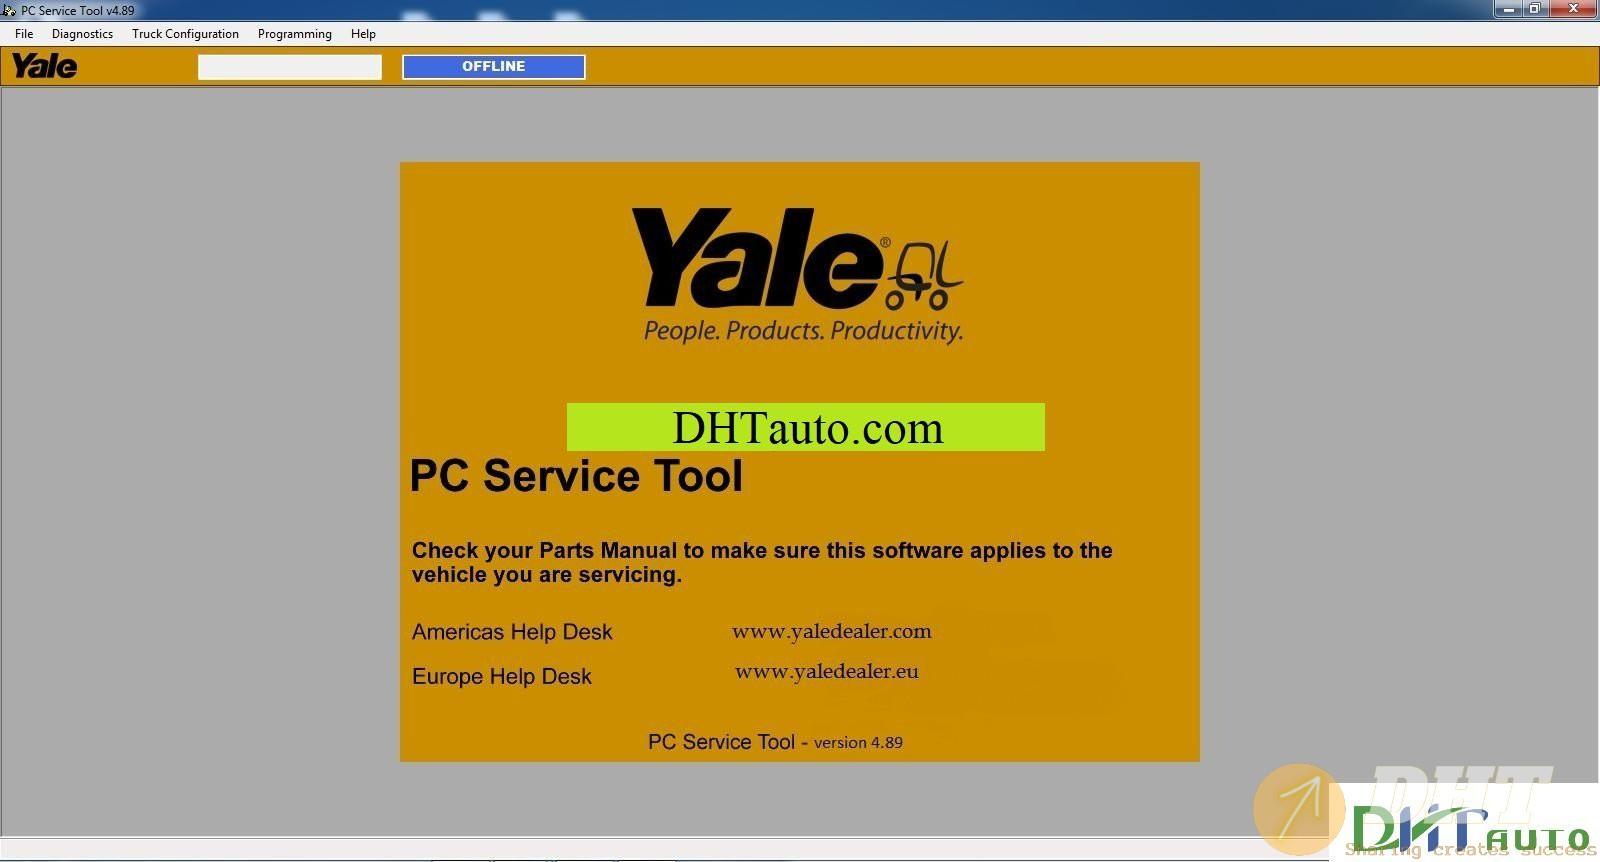 Yale-PC-Service-Tool-Version-4.89-2016-5.jpg